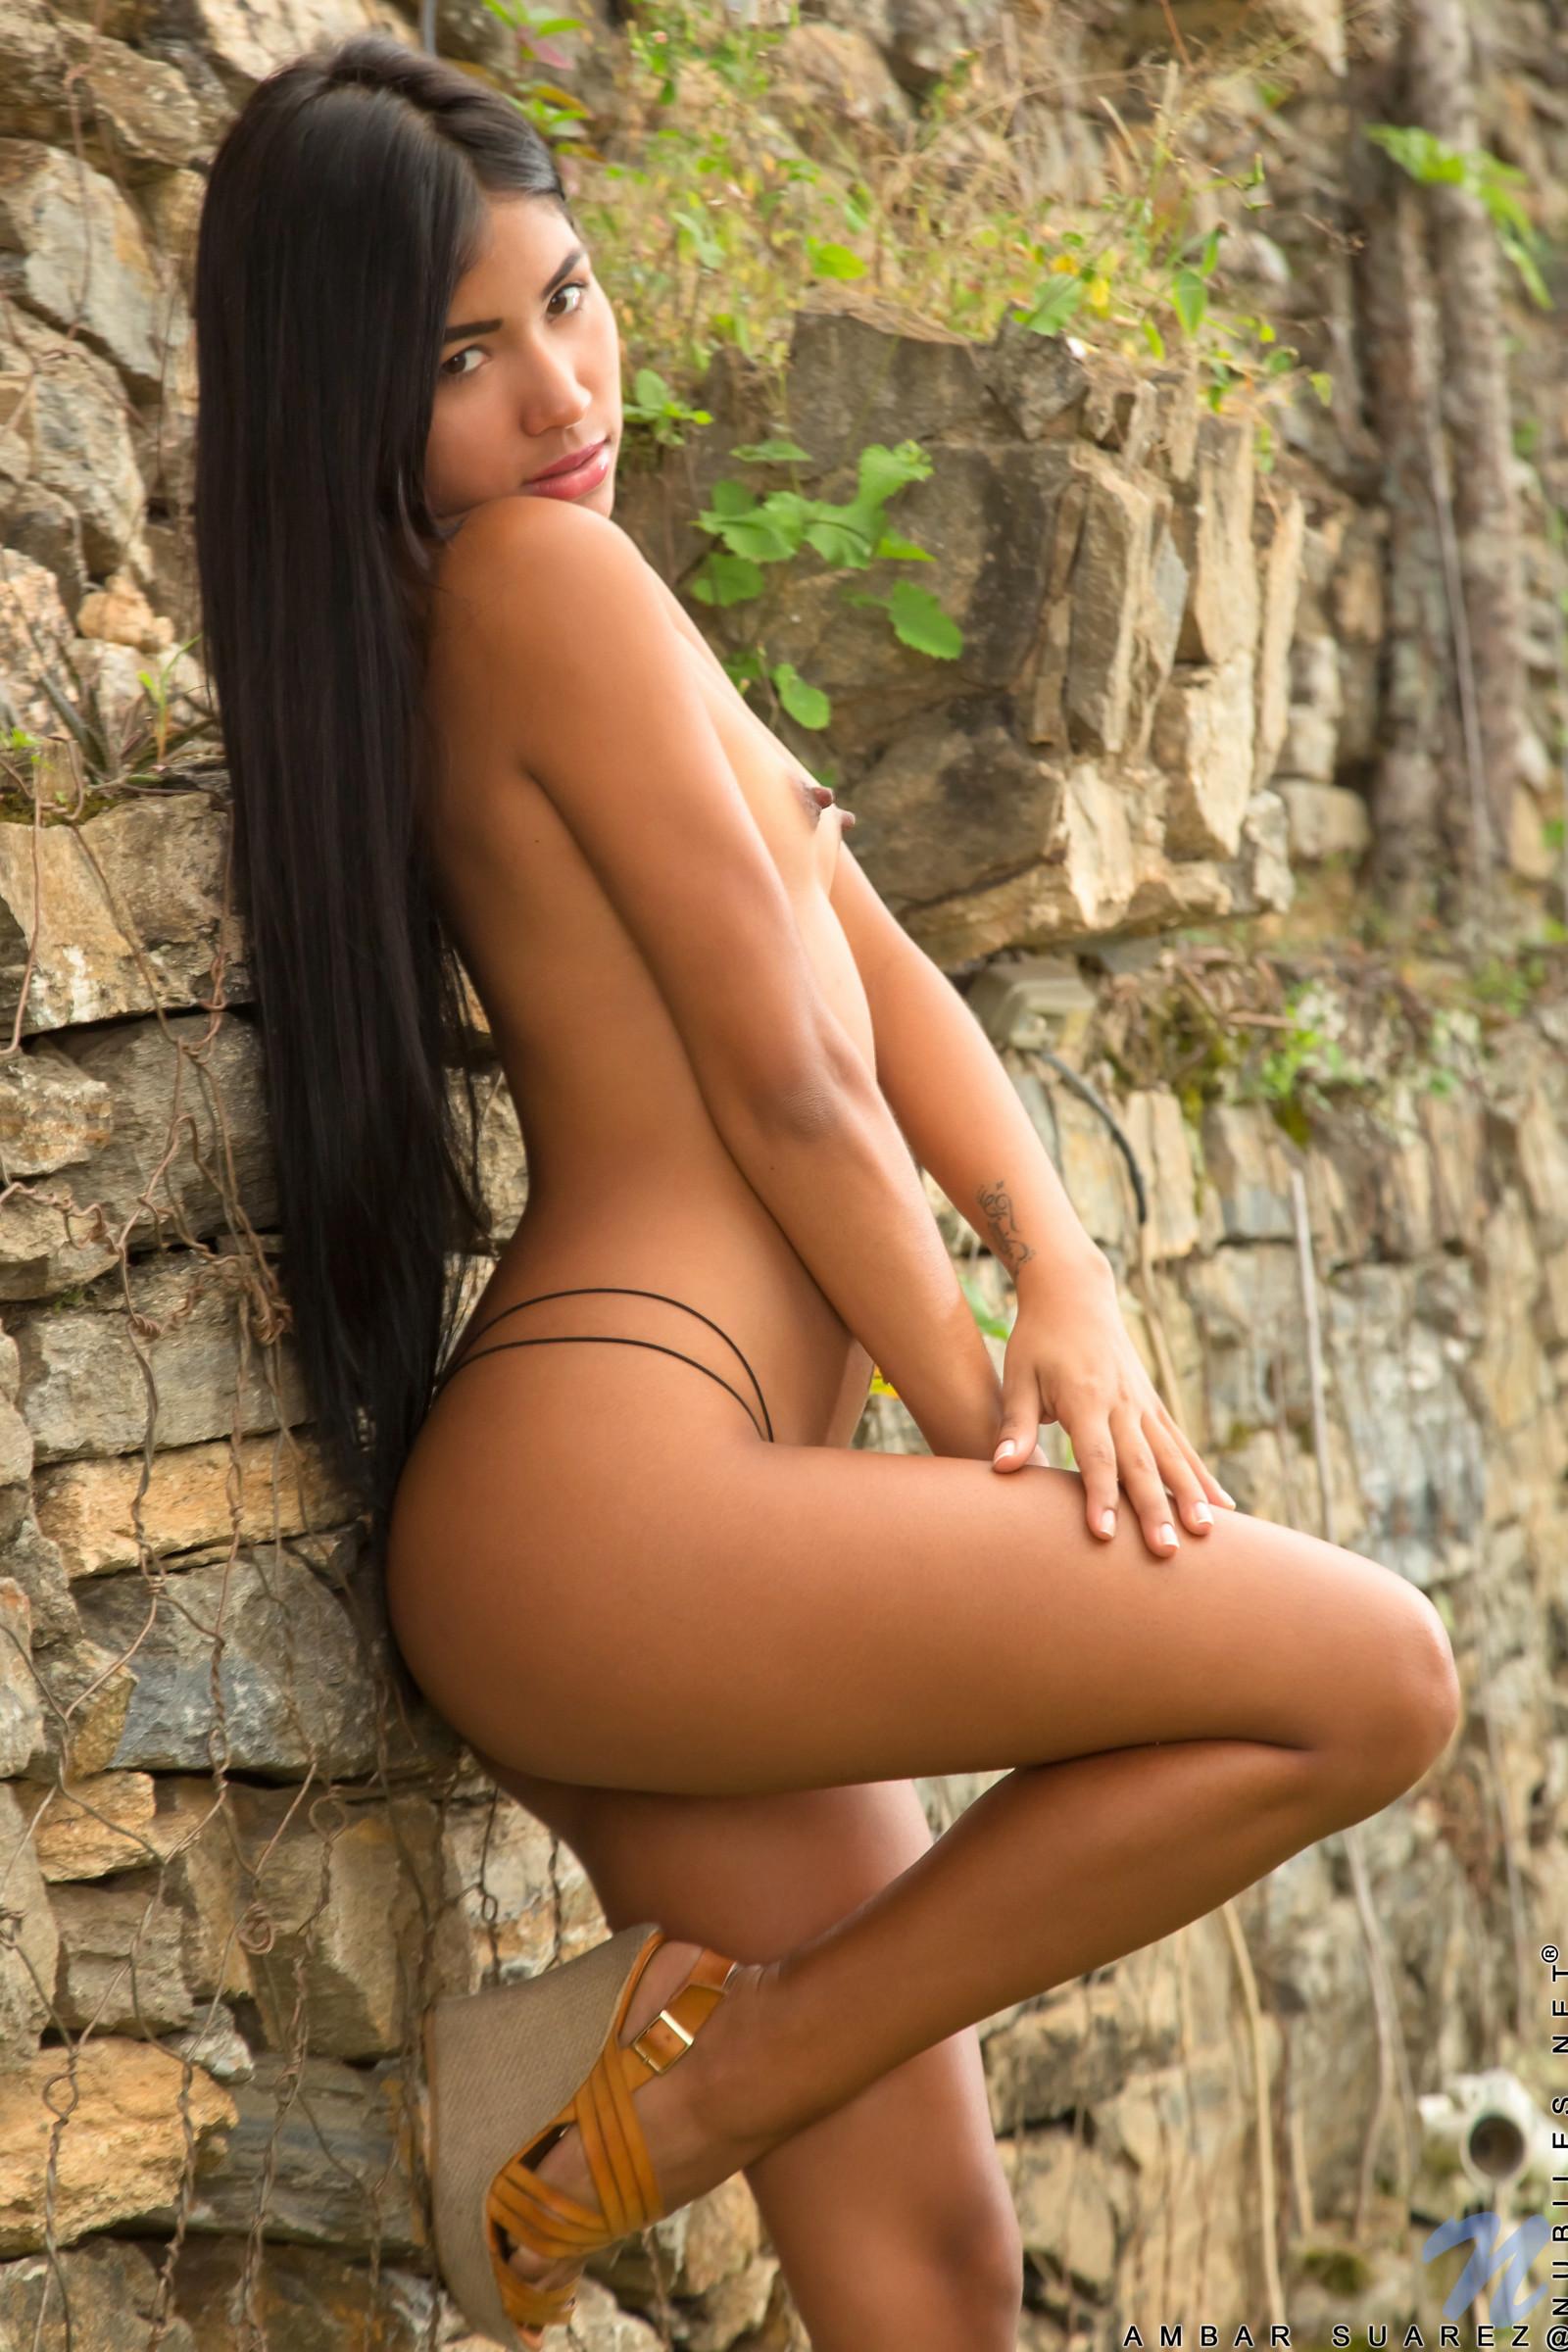 Bikini Irene Suarez Nude Pictures